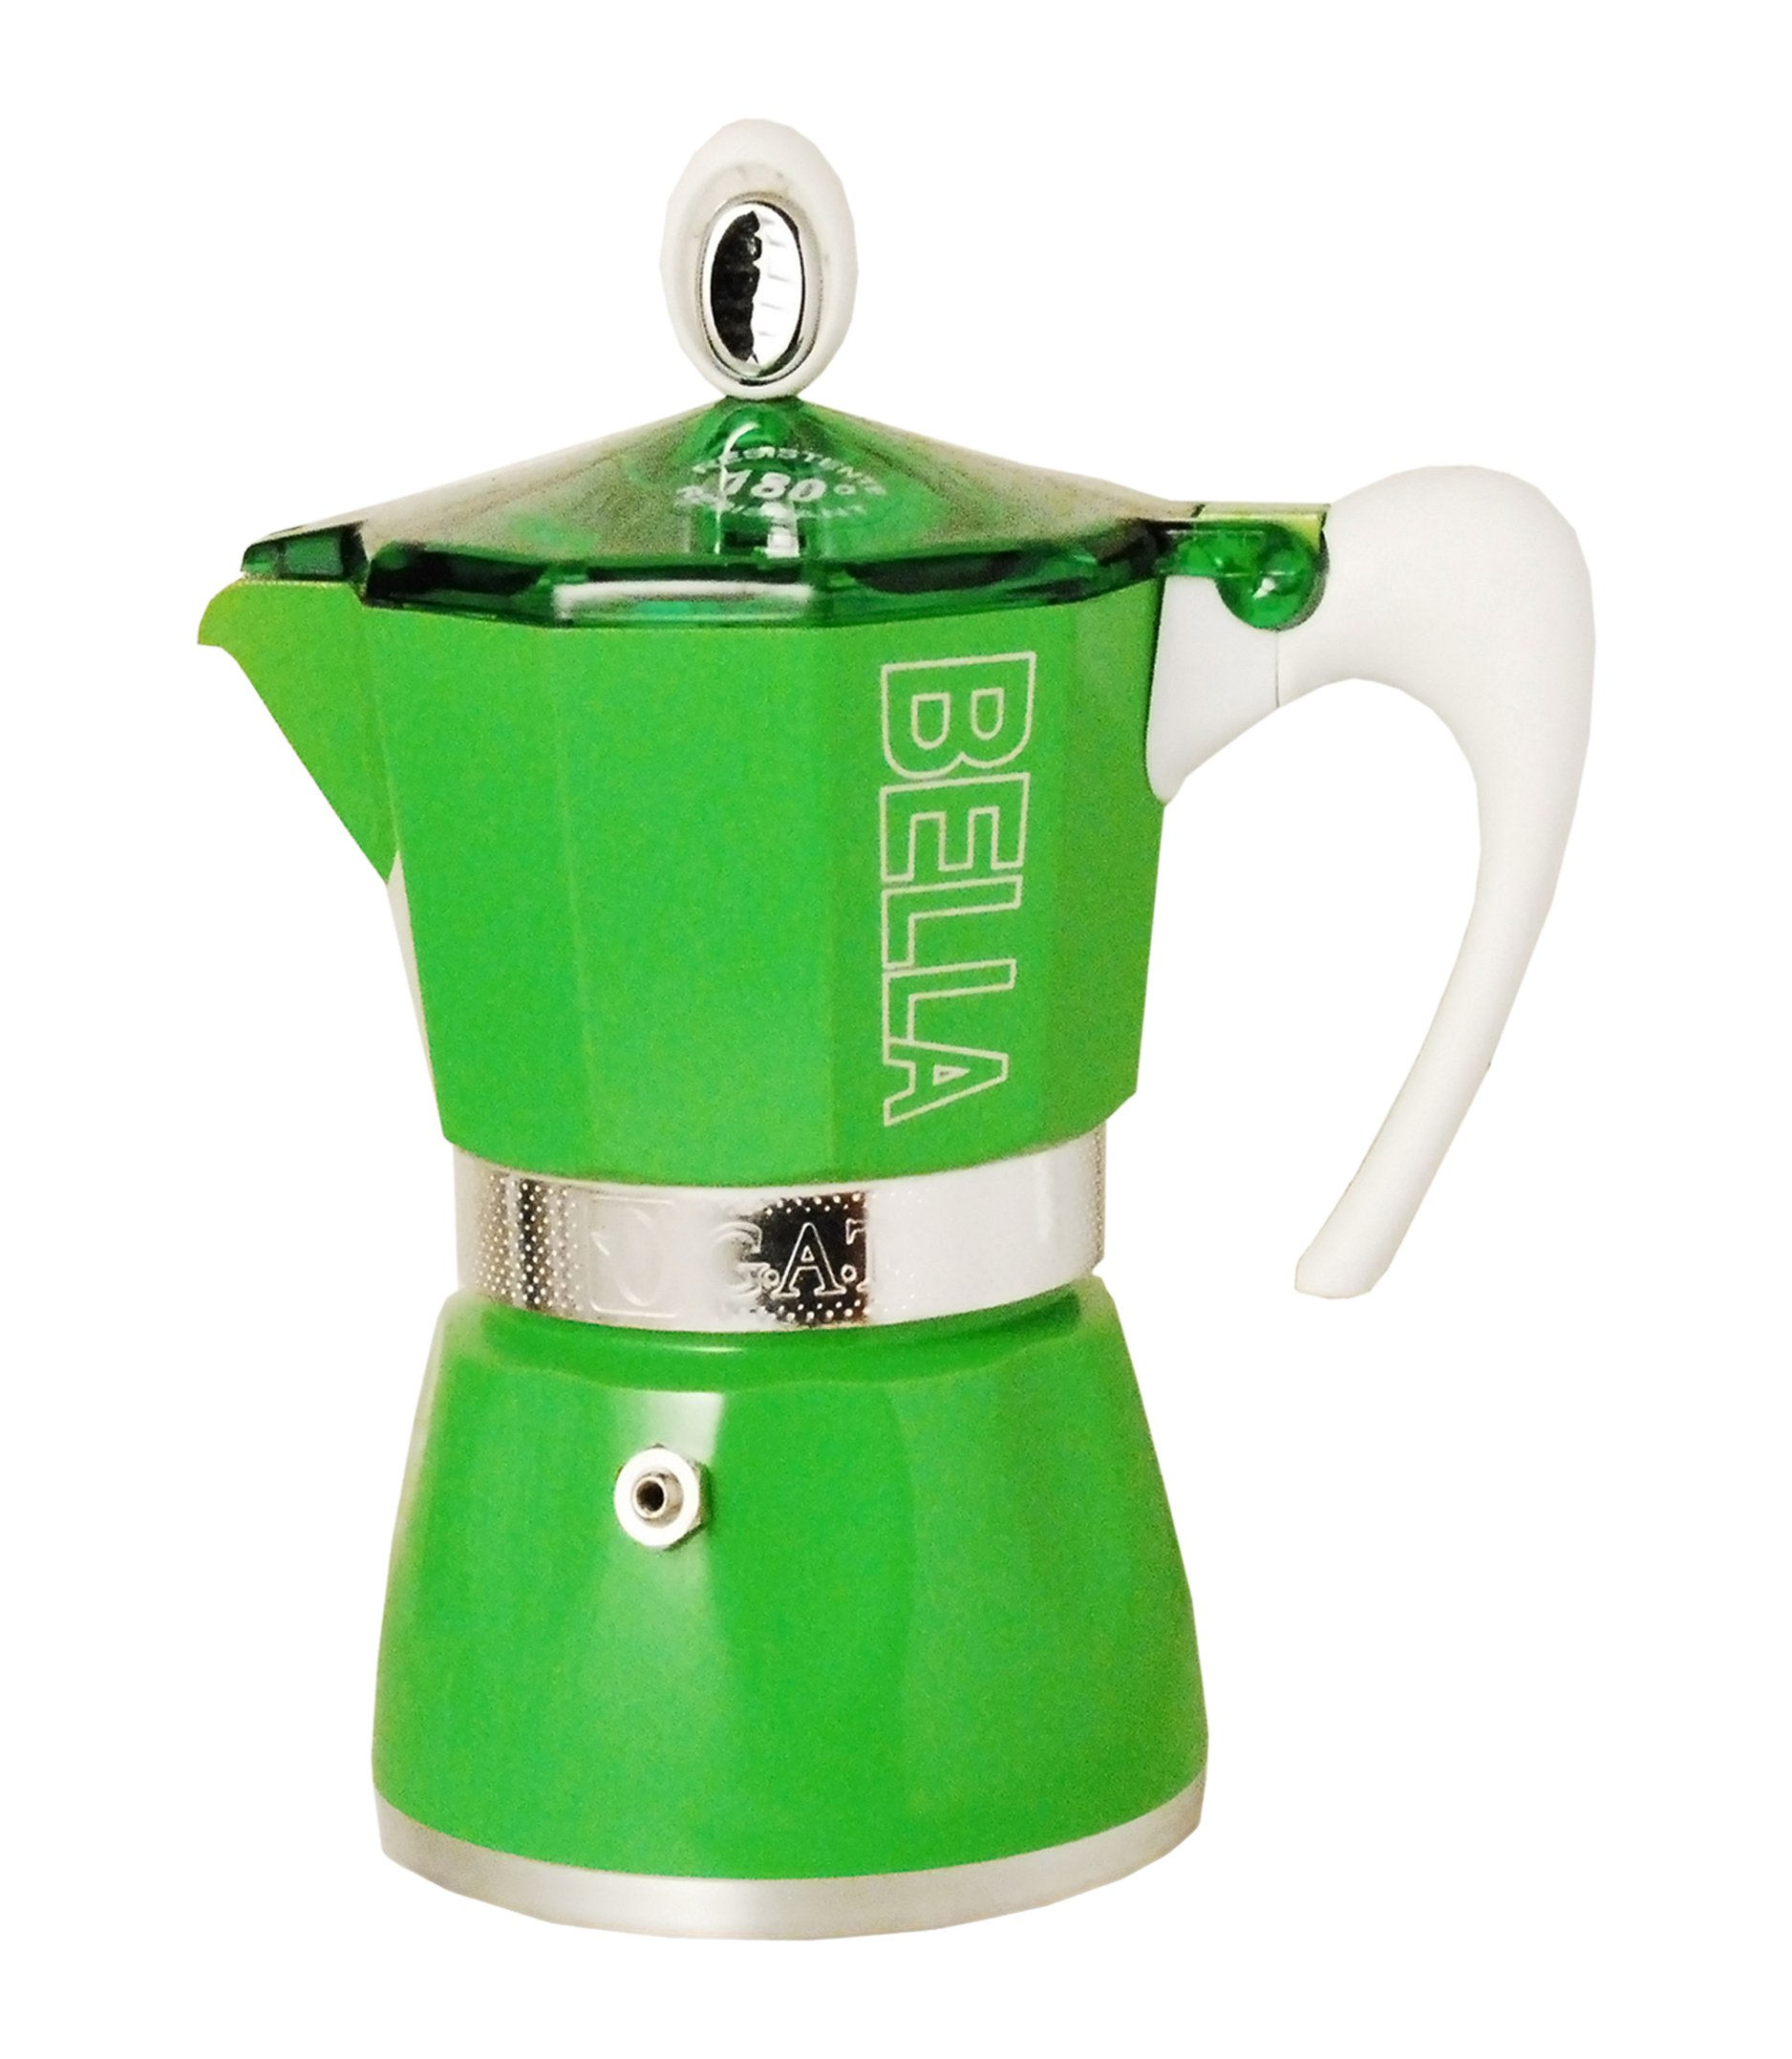 European Gift & Houseware 10-4809 9 Cup Bella Stove-Top Espresso Makers, Tropics Green